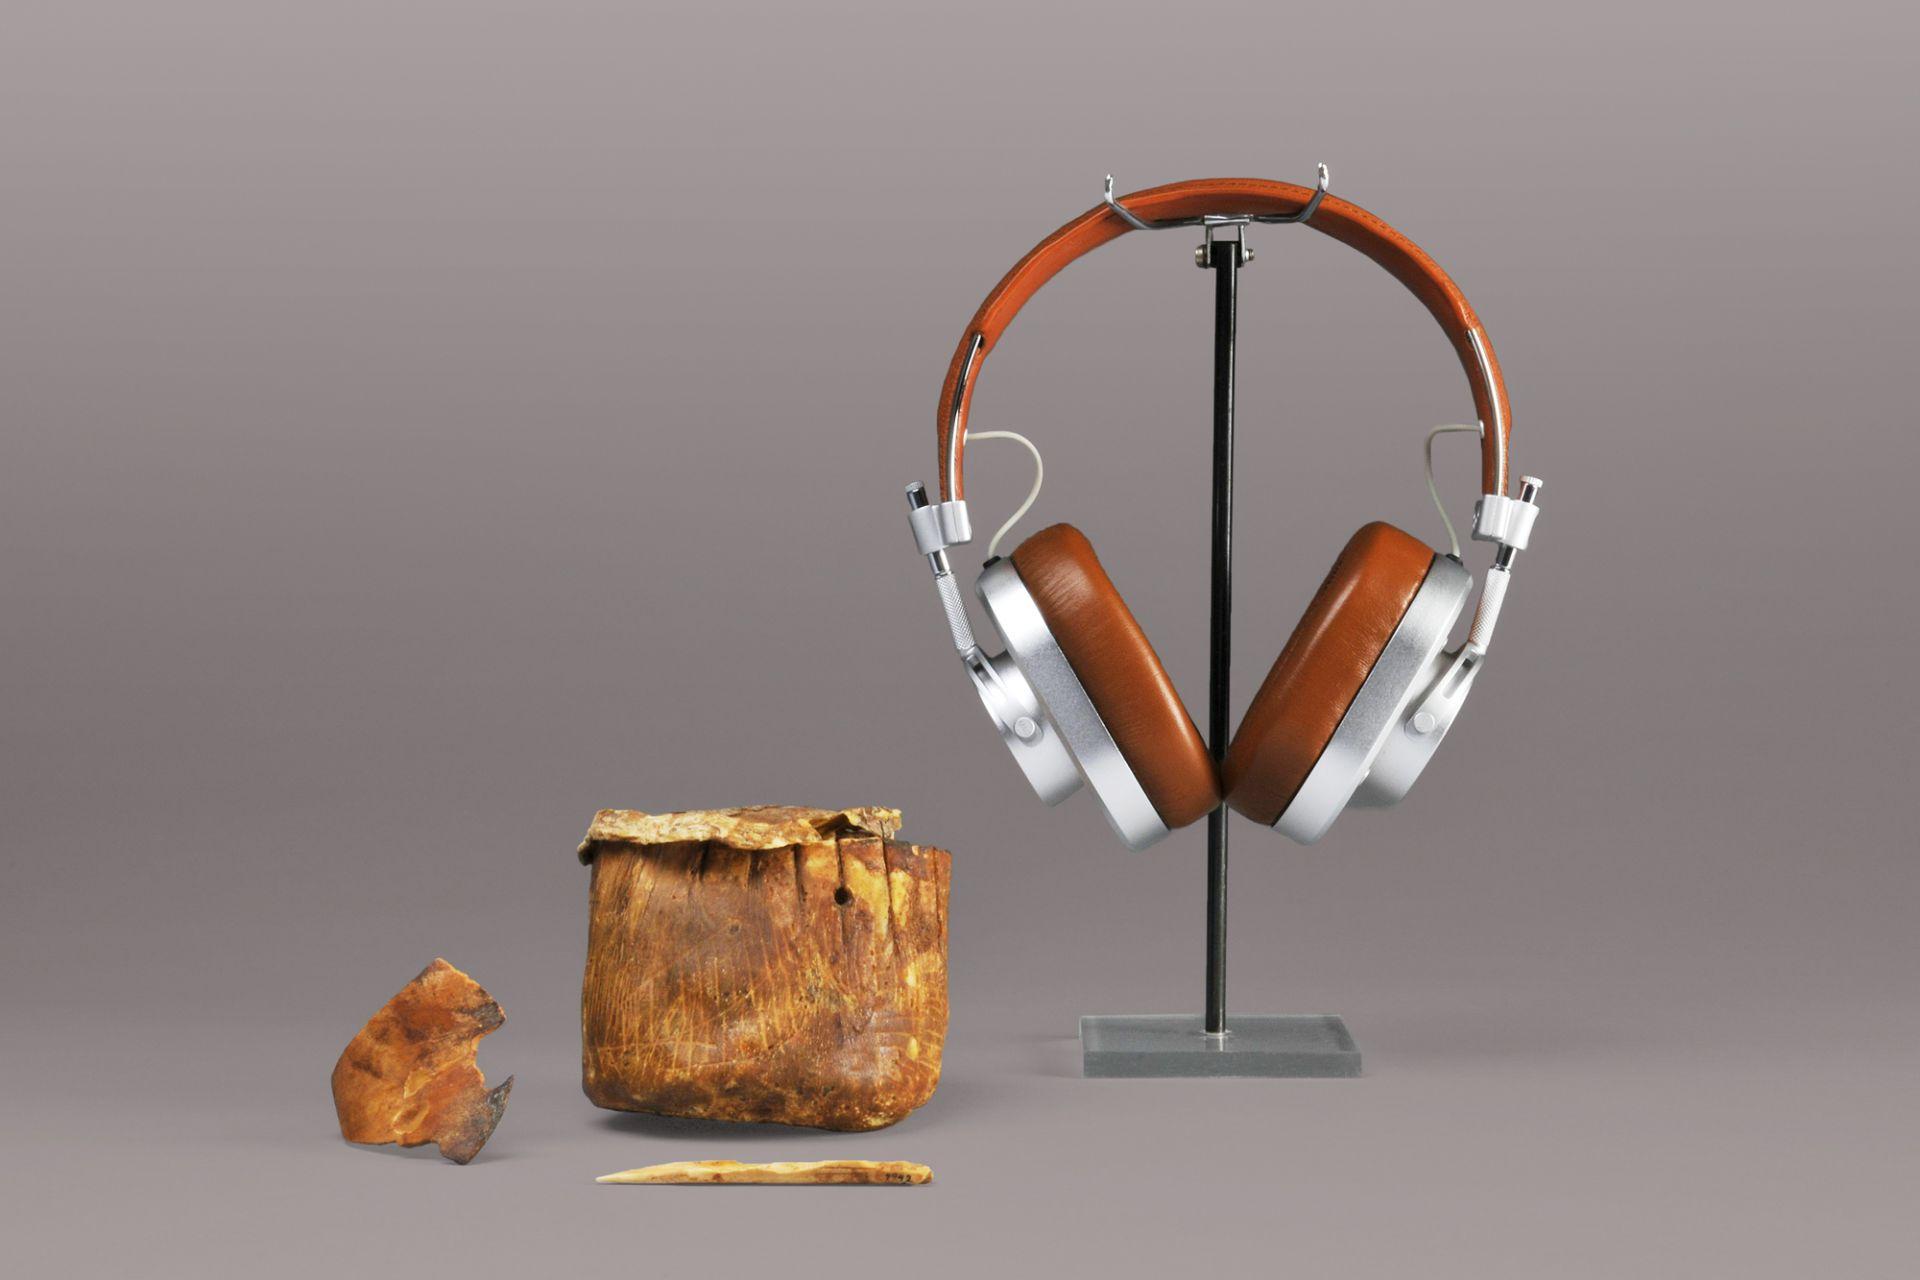 Rawhide vessel, Egypt, 4th millennium BCE and headphones, Master & Dynamic, New York, 2014